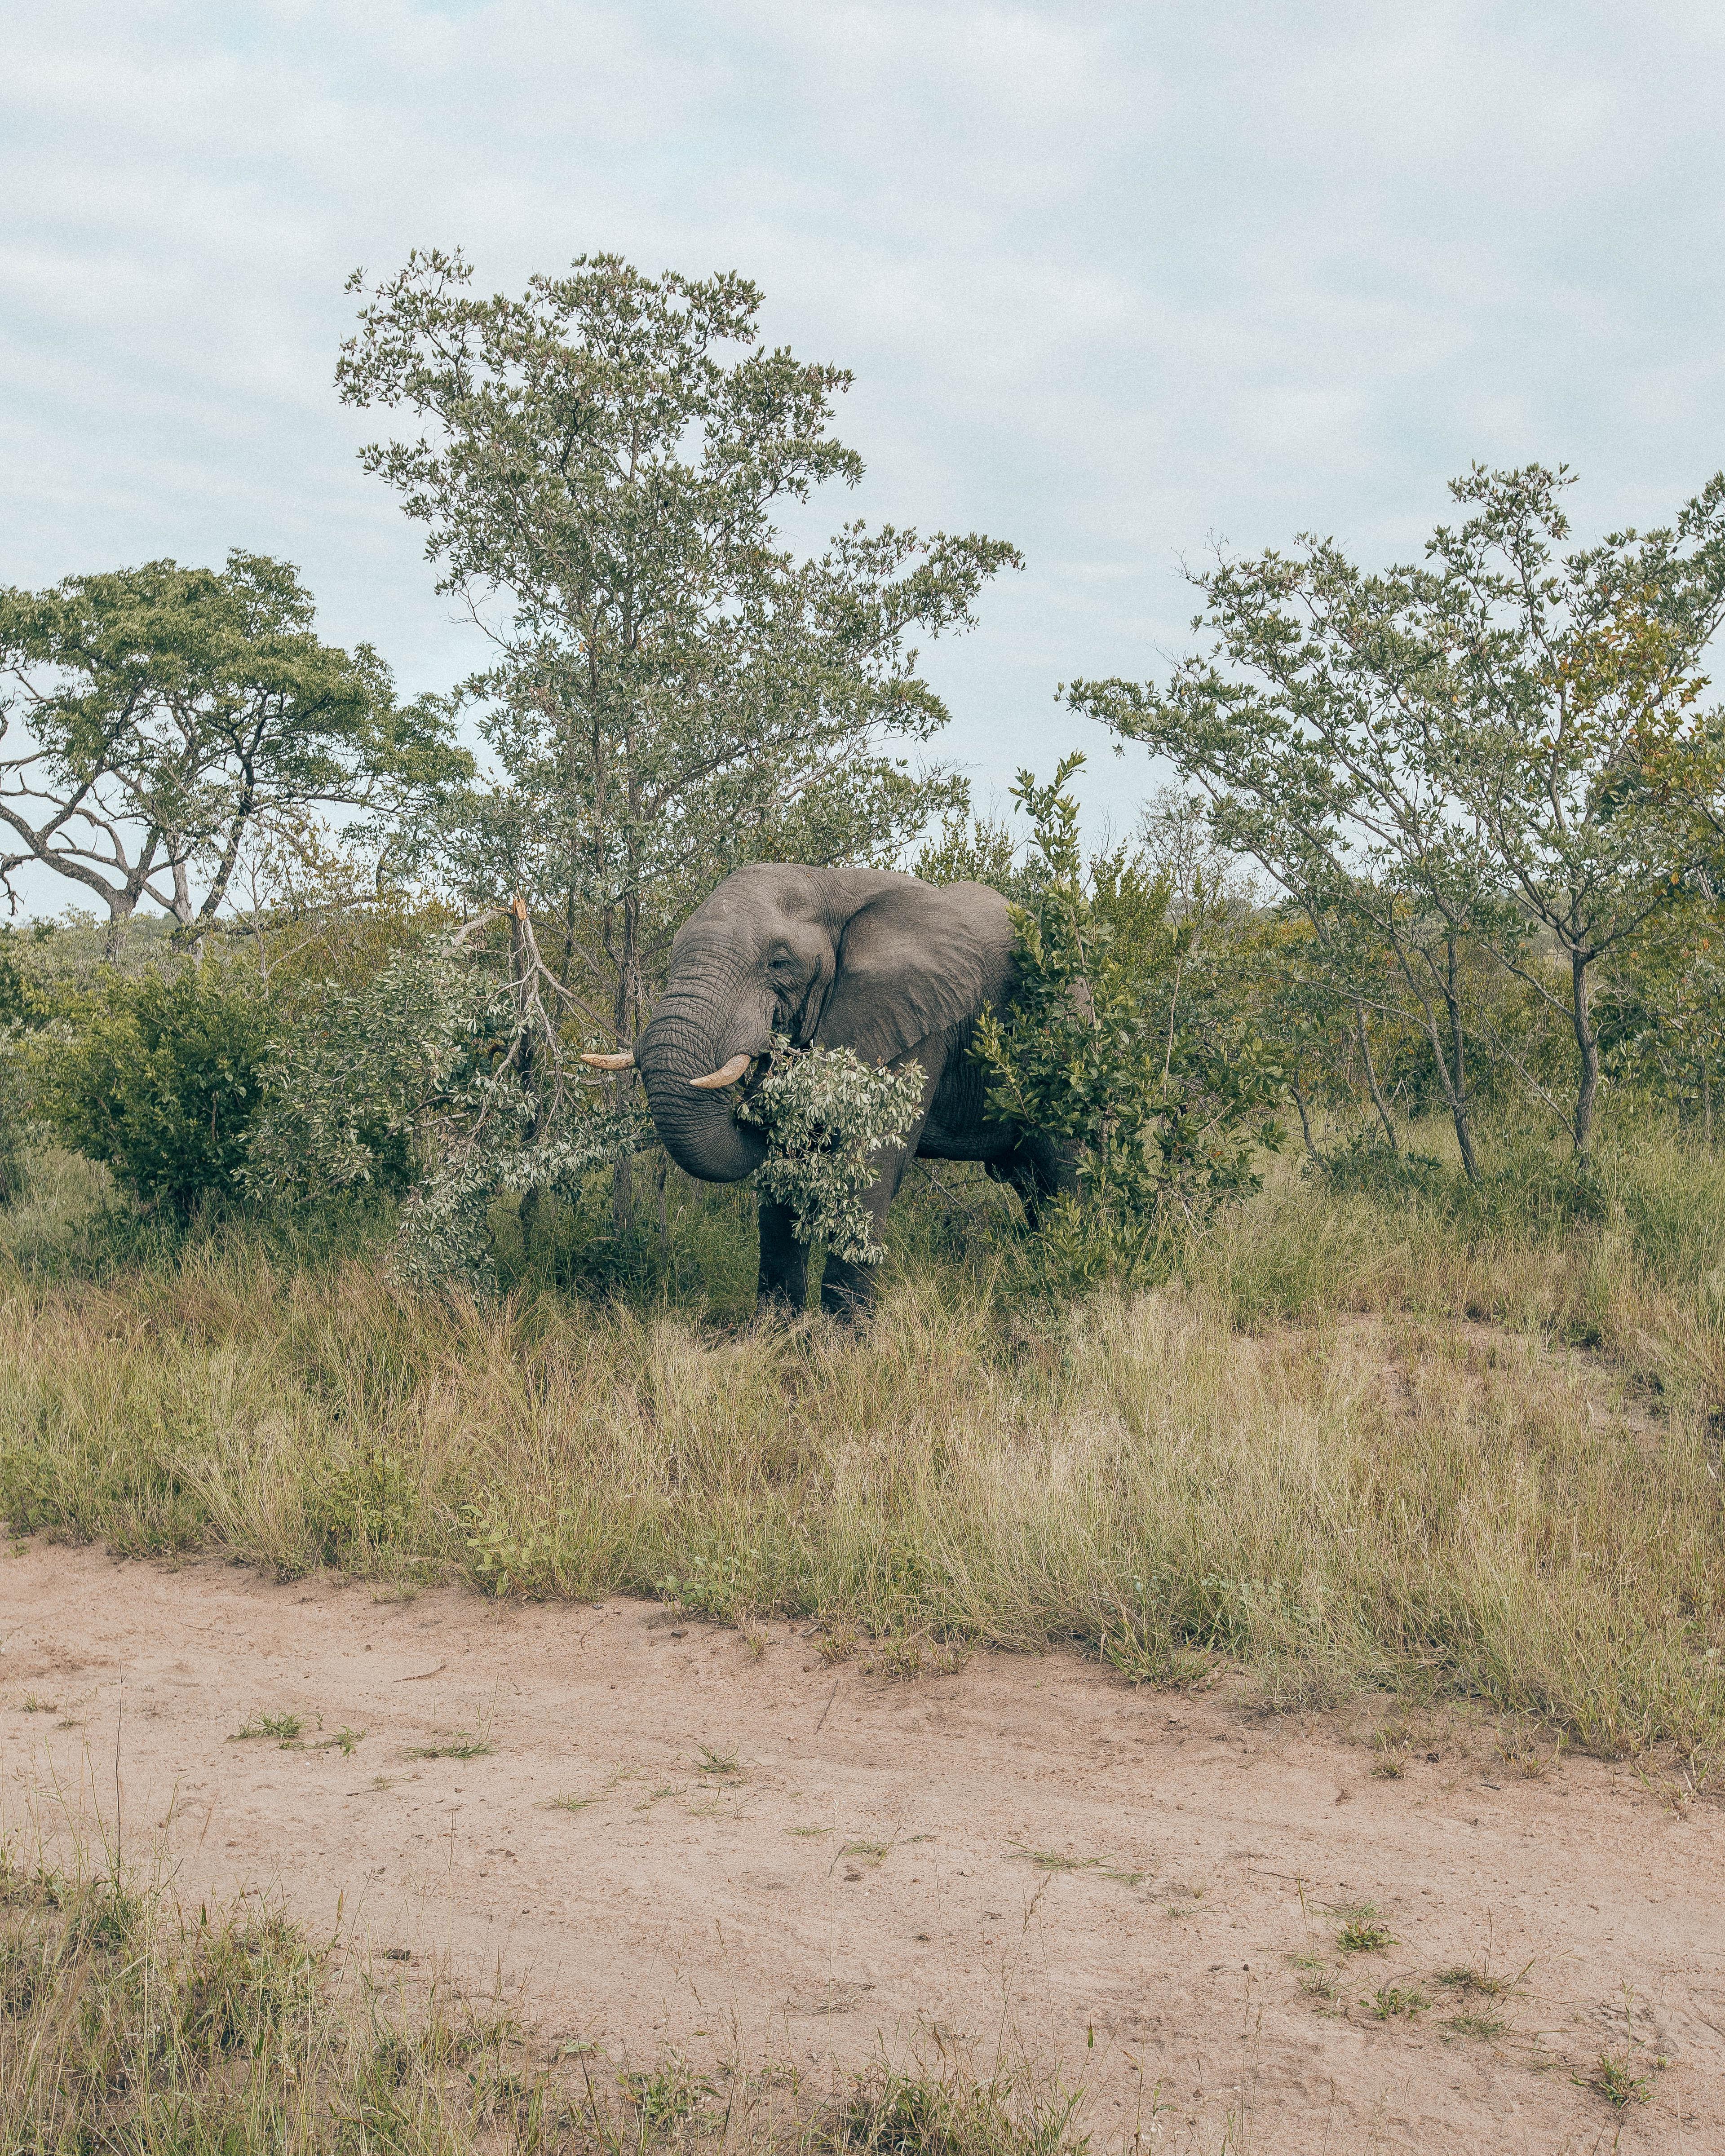 Elephant eating tree trunk.